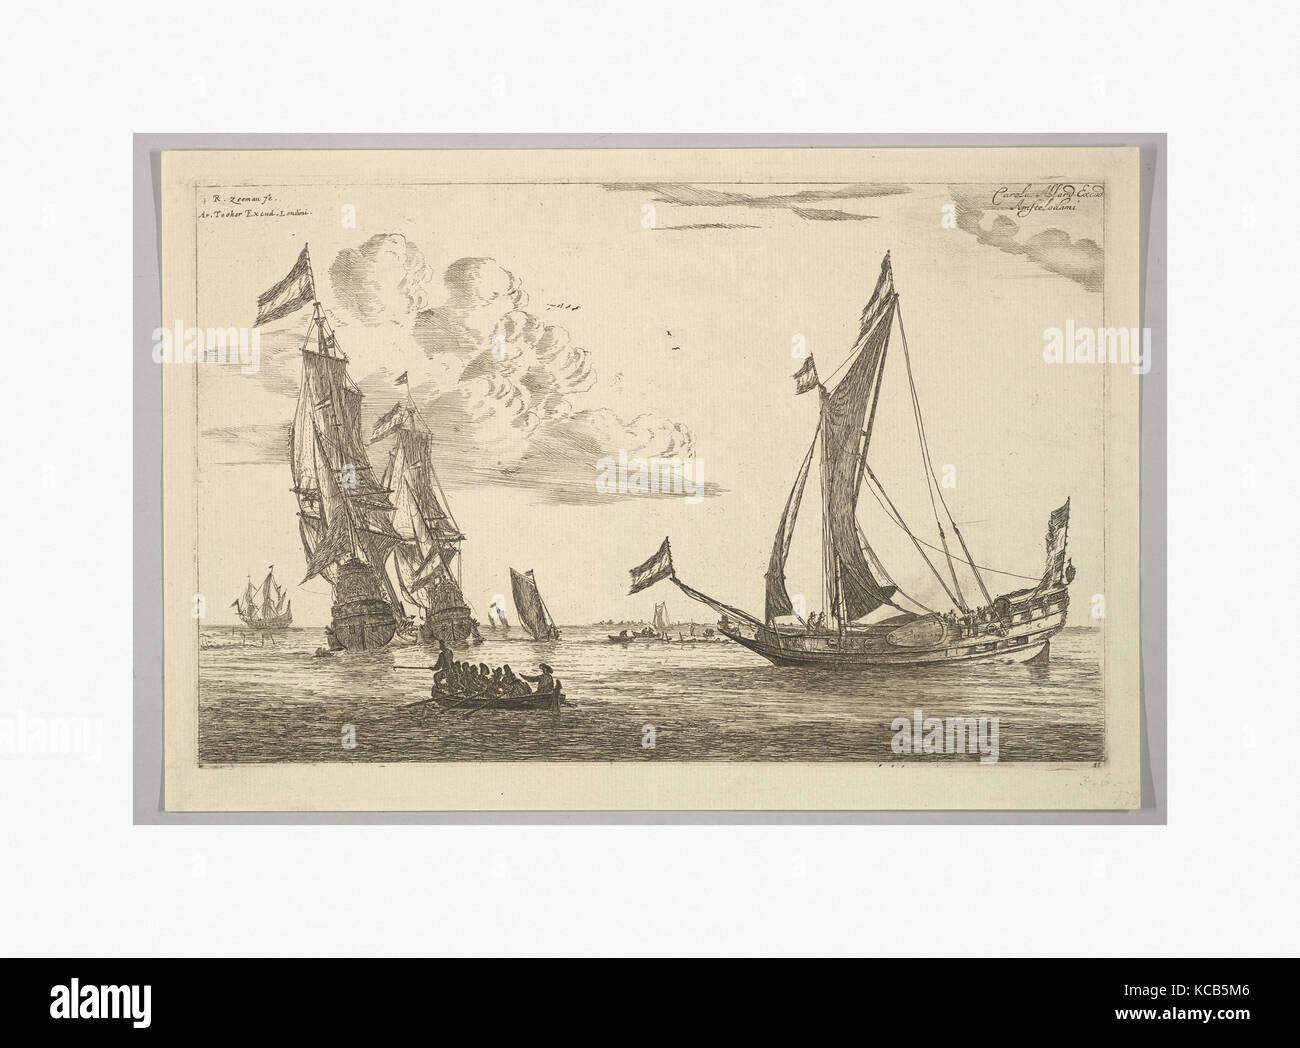 Sailing Vessels and Sloop, Reinier Nooms, called Zeeman, 17th century - Stock Image